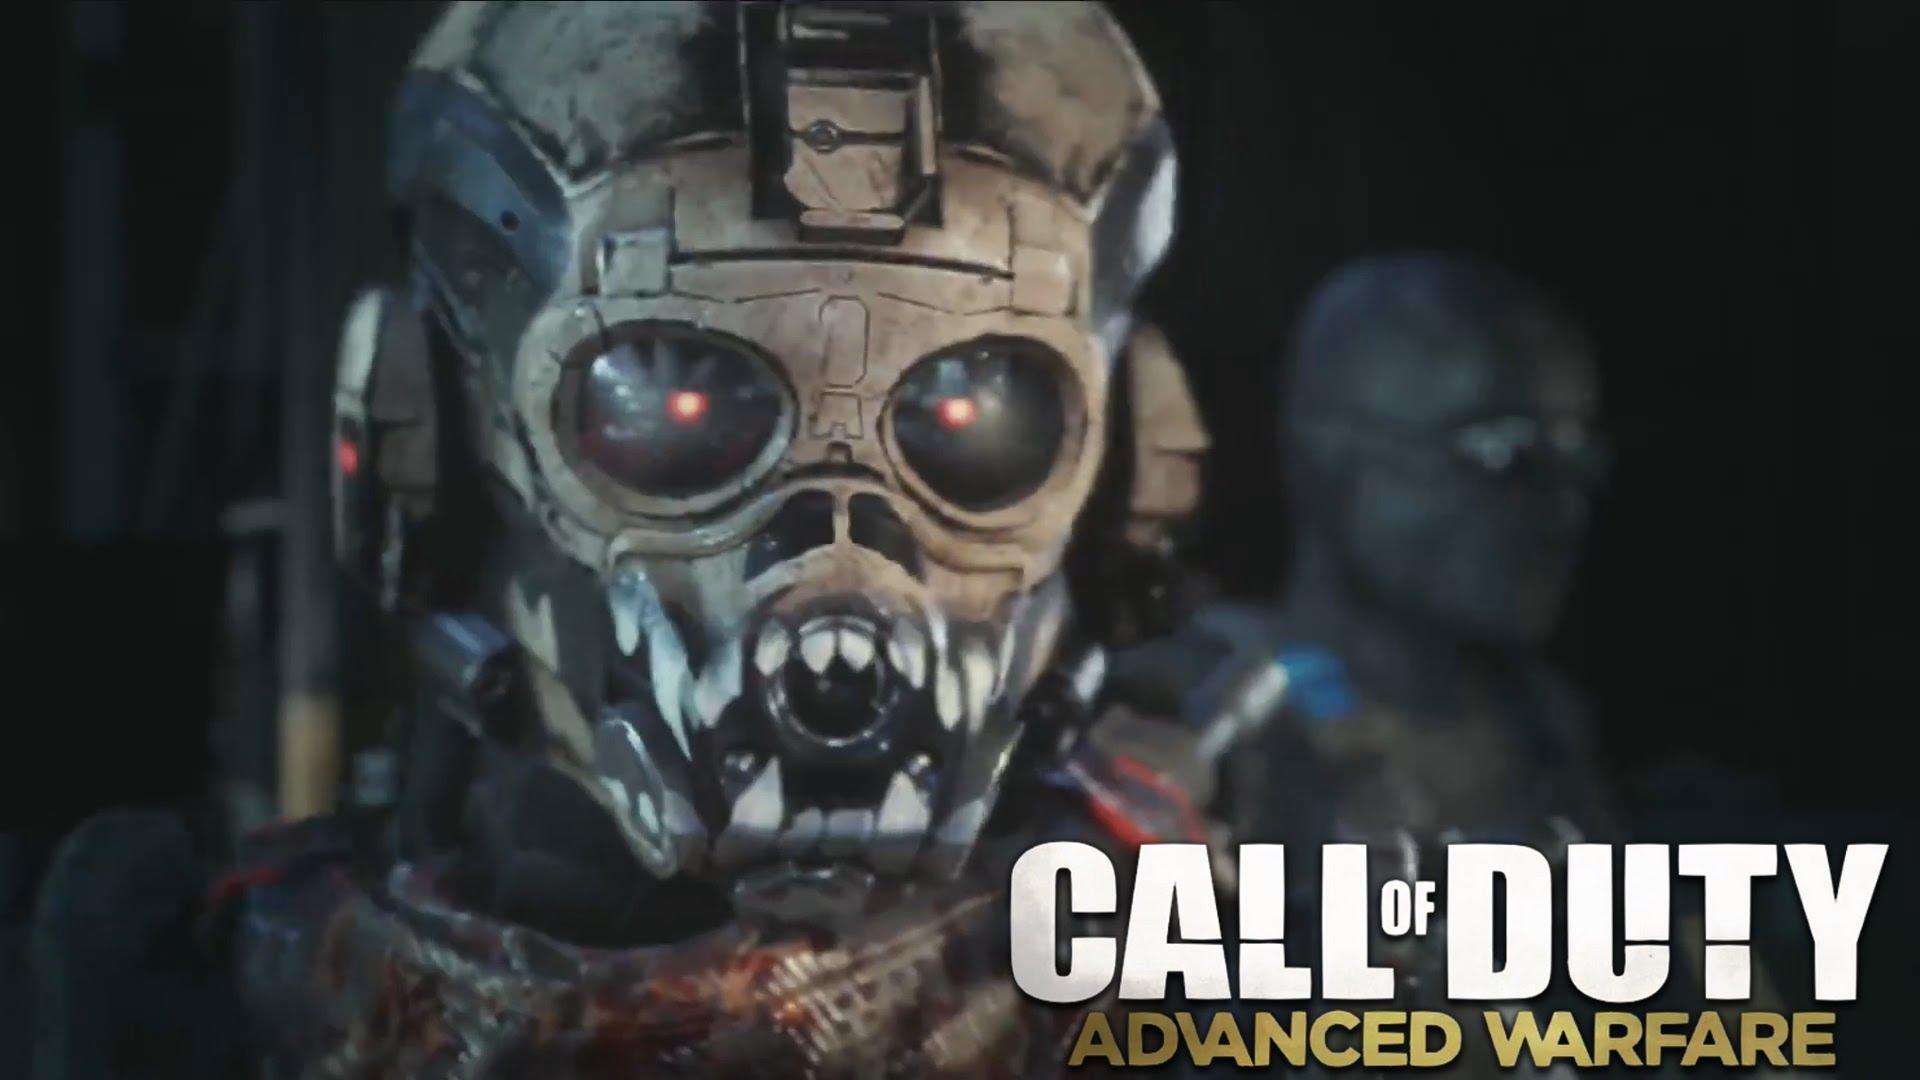 download Call of Duty Advanced Warfare EXO SURVIVAL CO OP 1920x1080